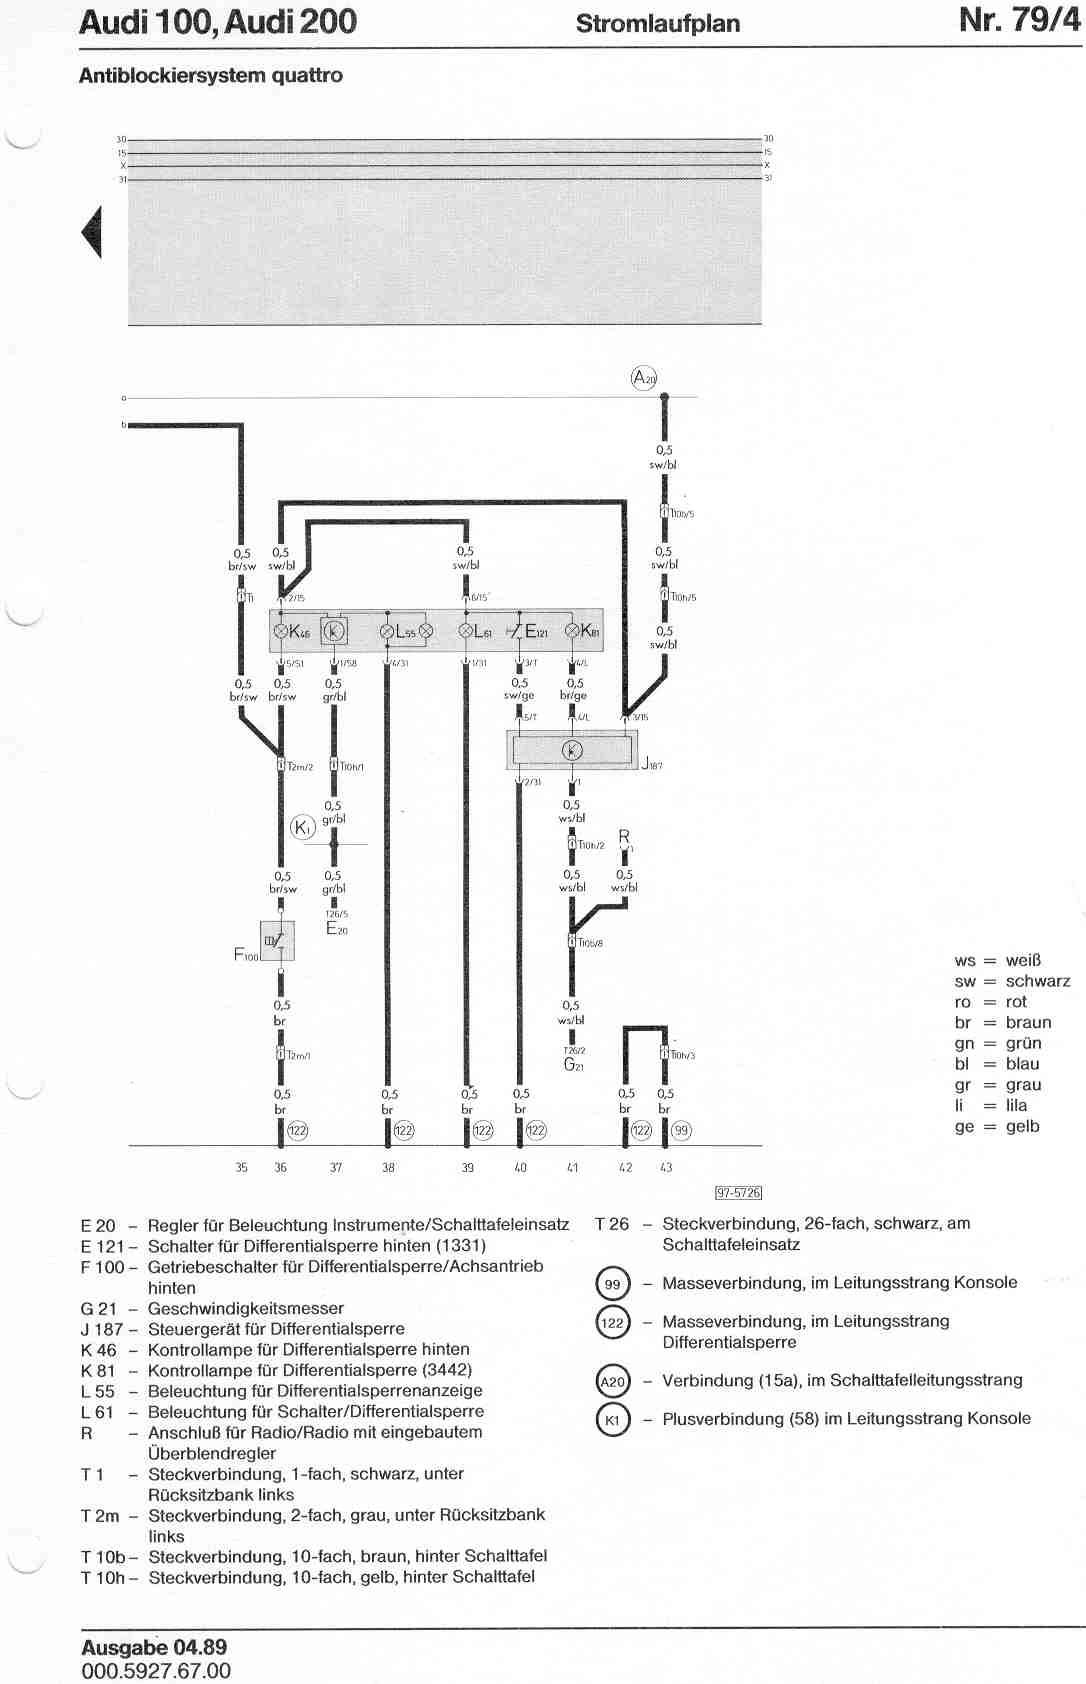 audi 100 200 factory wiring diagrams rh sizov org audi 100 c4 wiring diagram Audi A4 Wiring Diagram